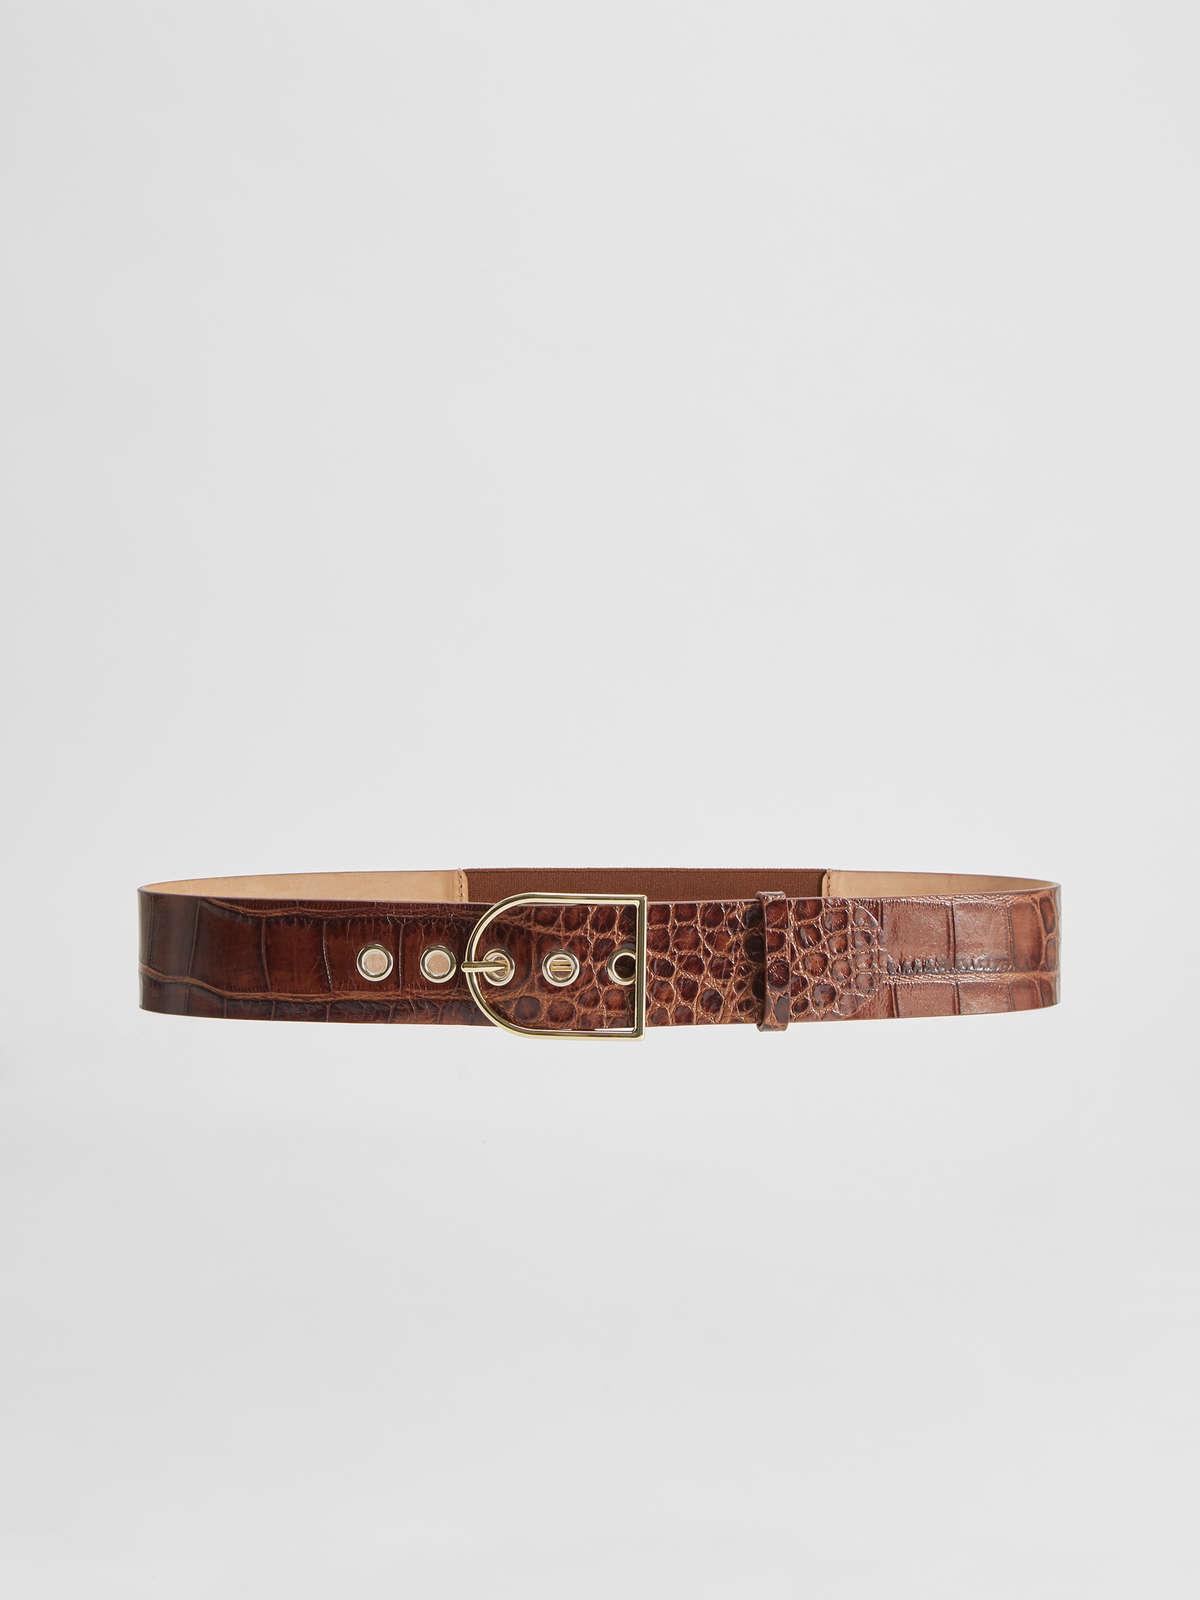 Crocodile print leather belt - Max Mara